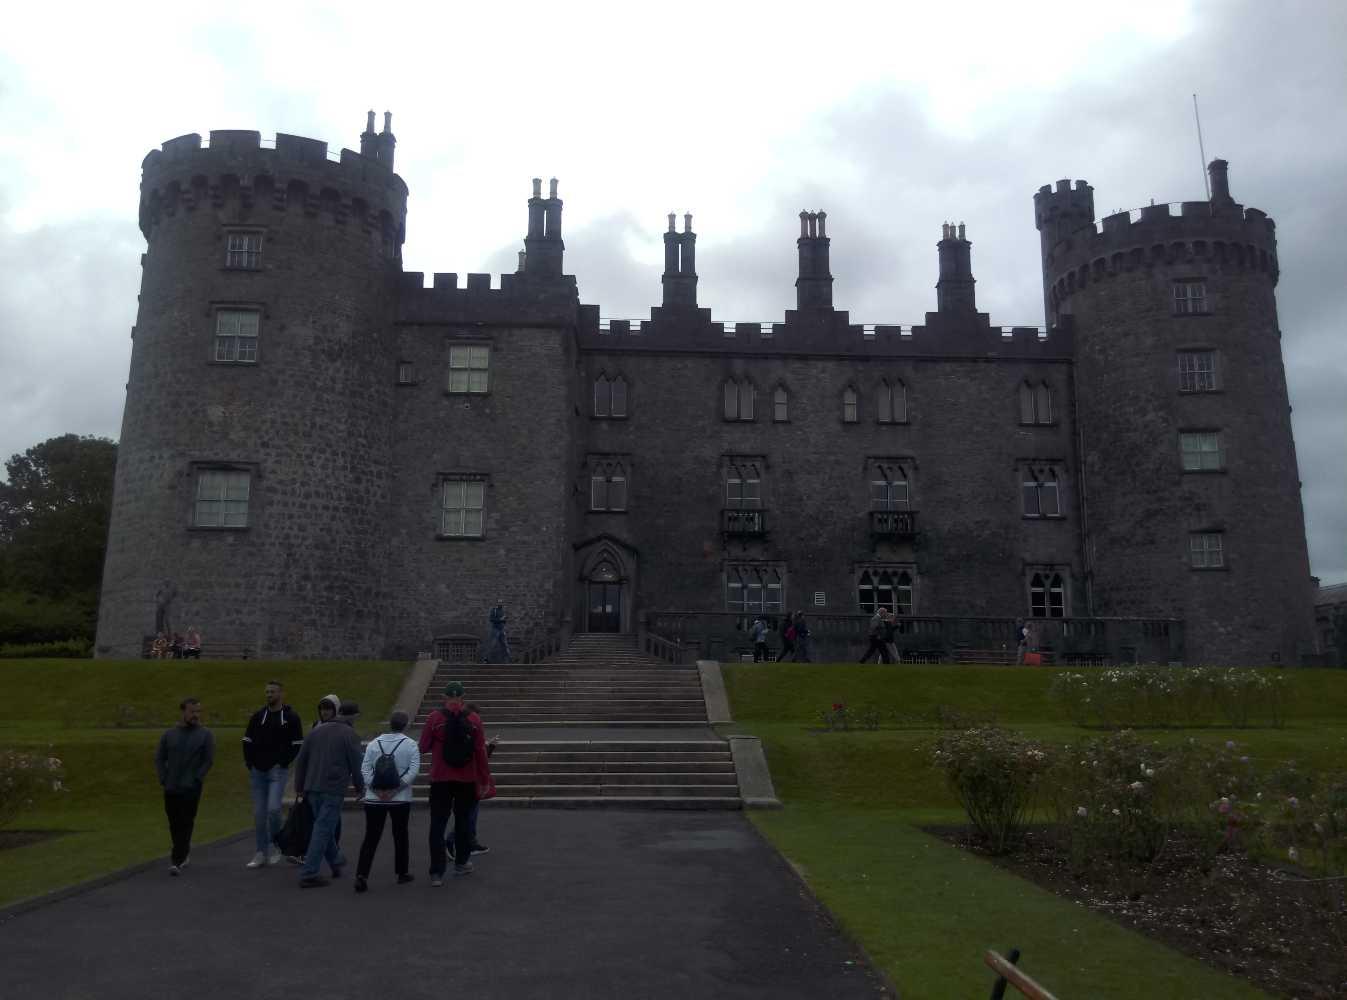 August 2019 - Kilkenny, Ireland (Part 3)